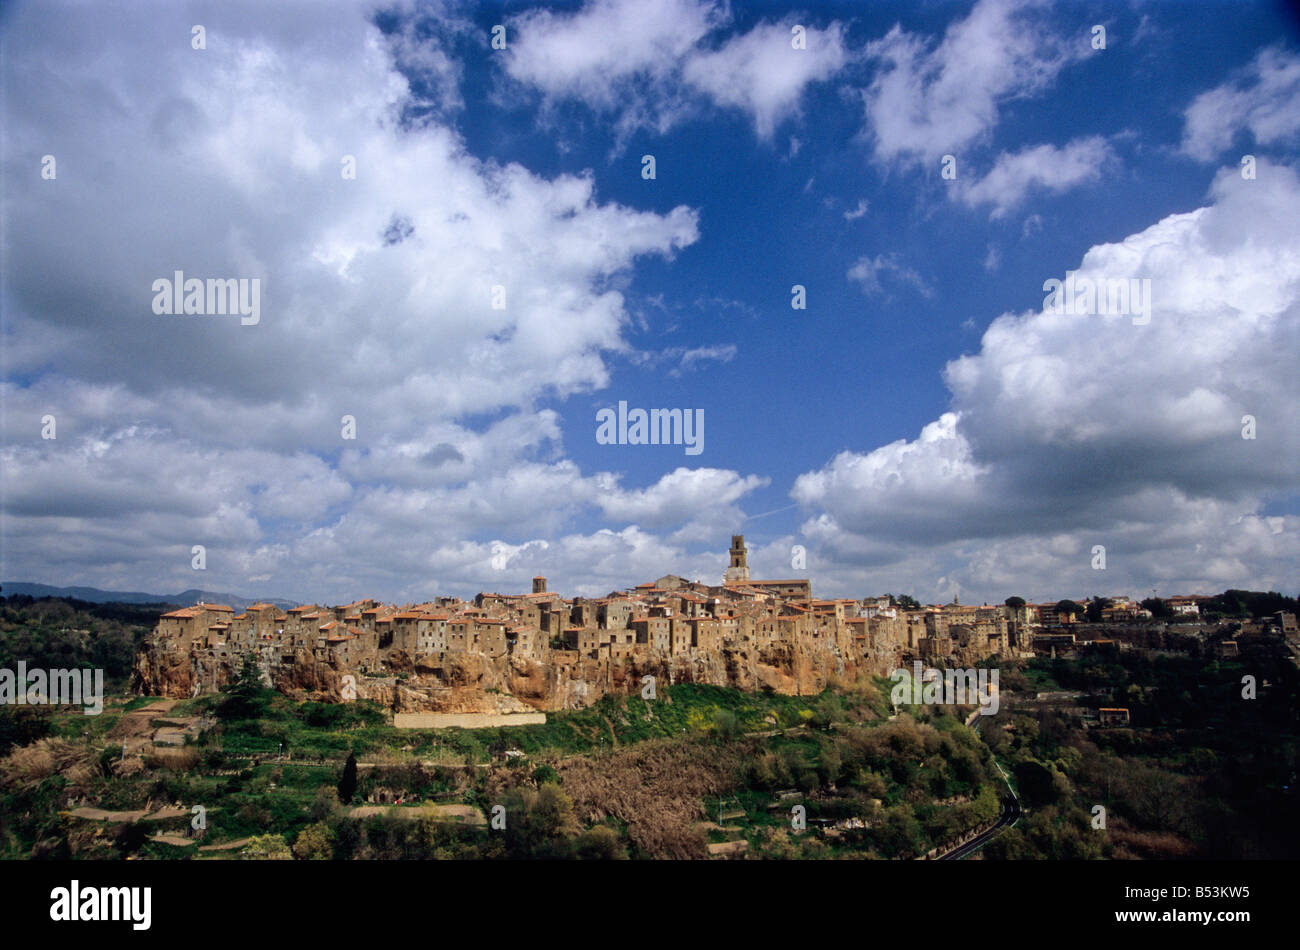 pitigliano, grosseto province, tuscany, italy - Stock Image